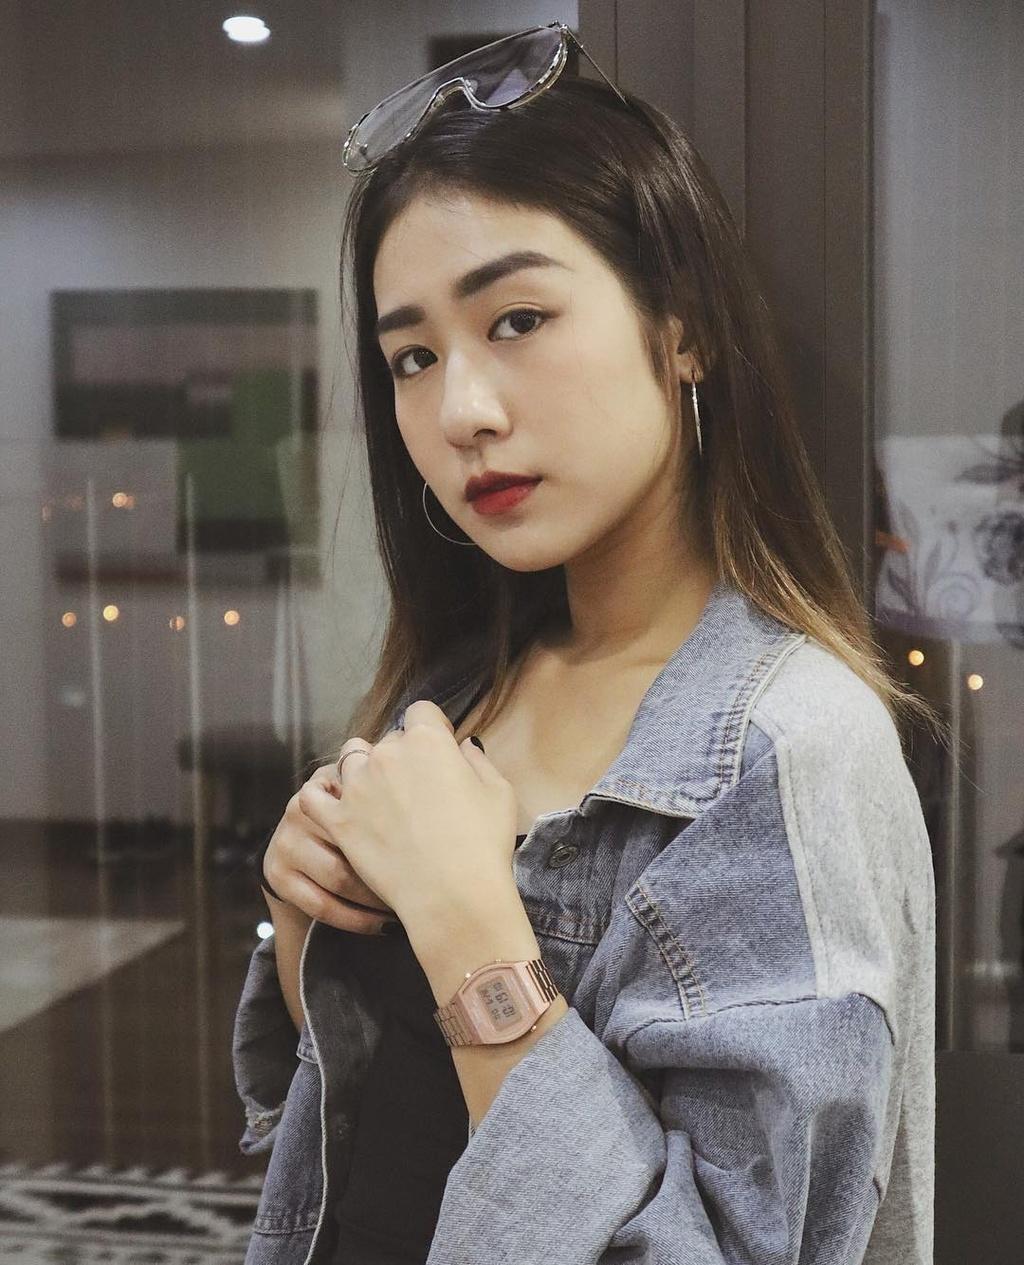 Hot girl tuoi Hoi: Nguoi hanh phuc ben chong, ke theo nghiep dien xuat hinh anh 6